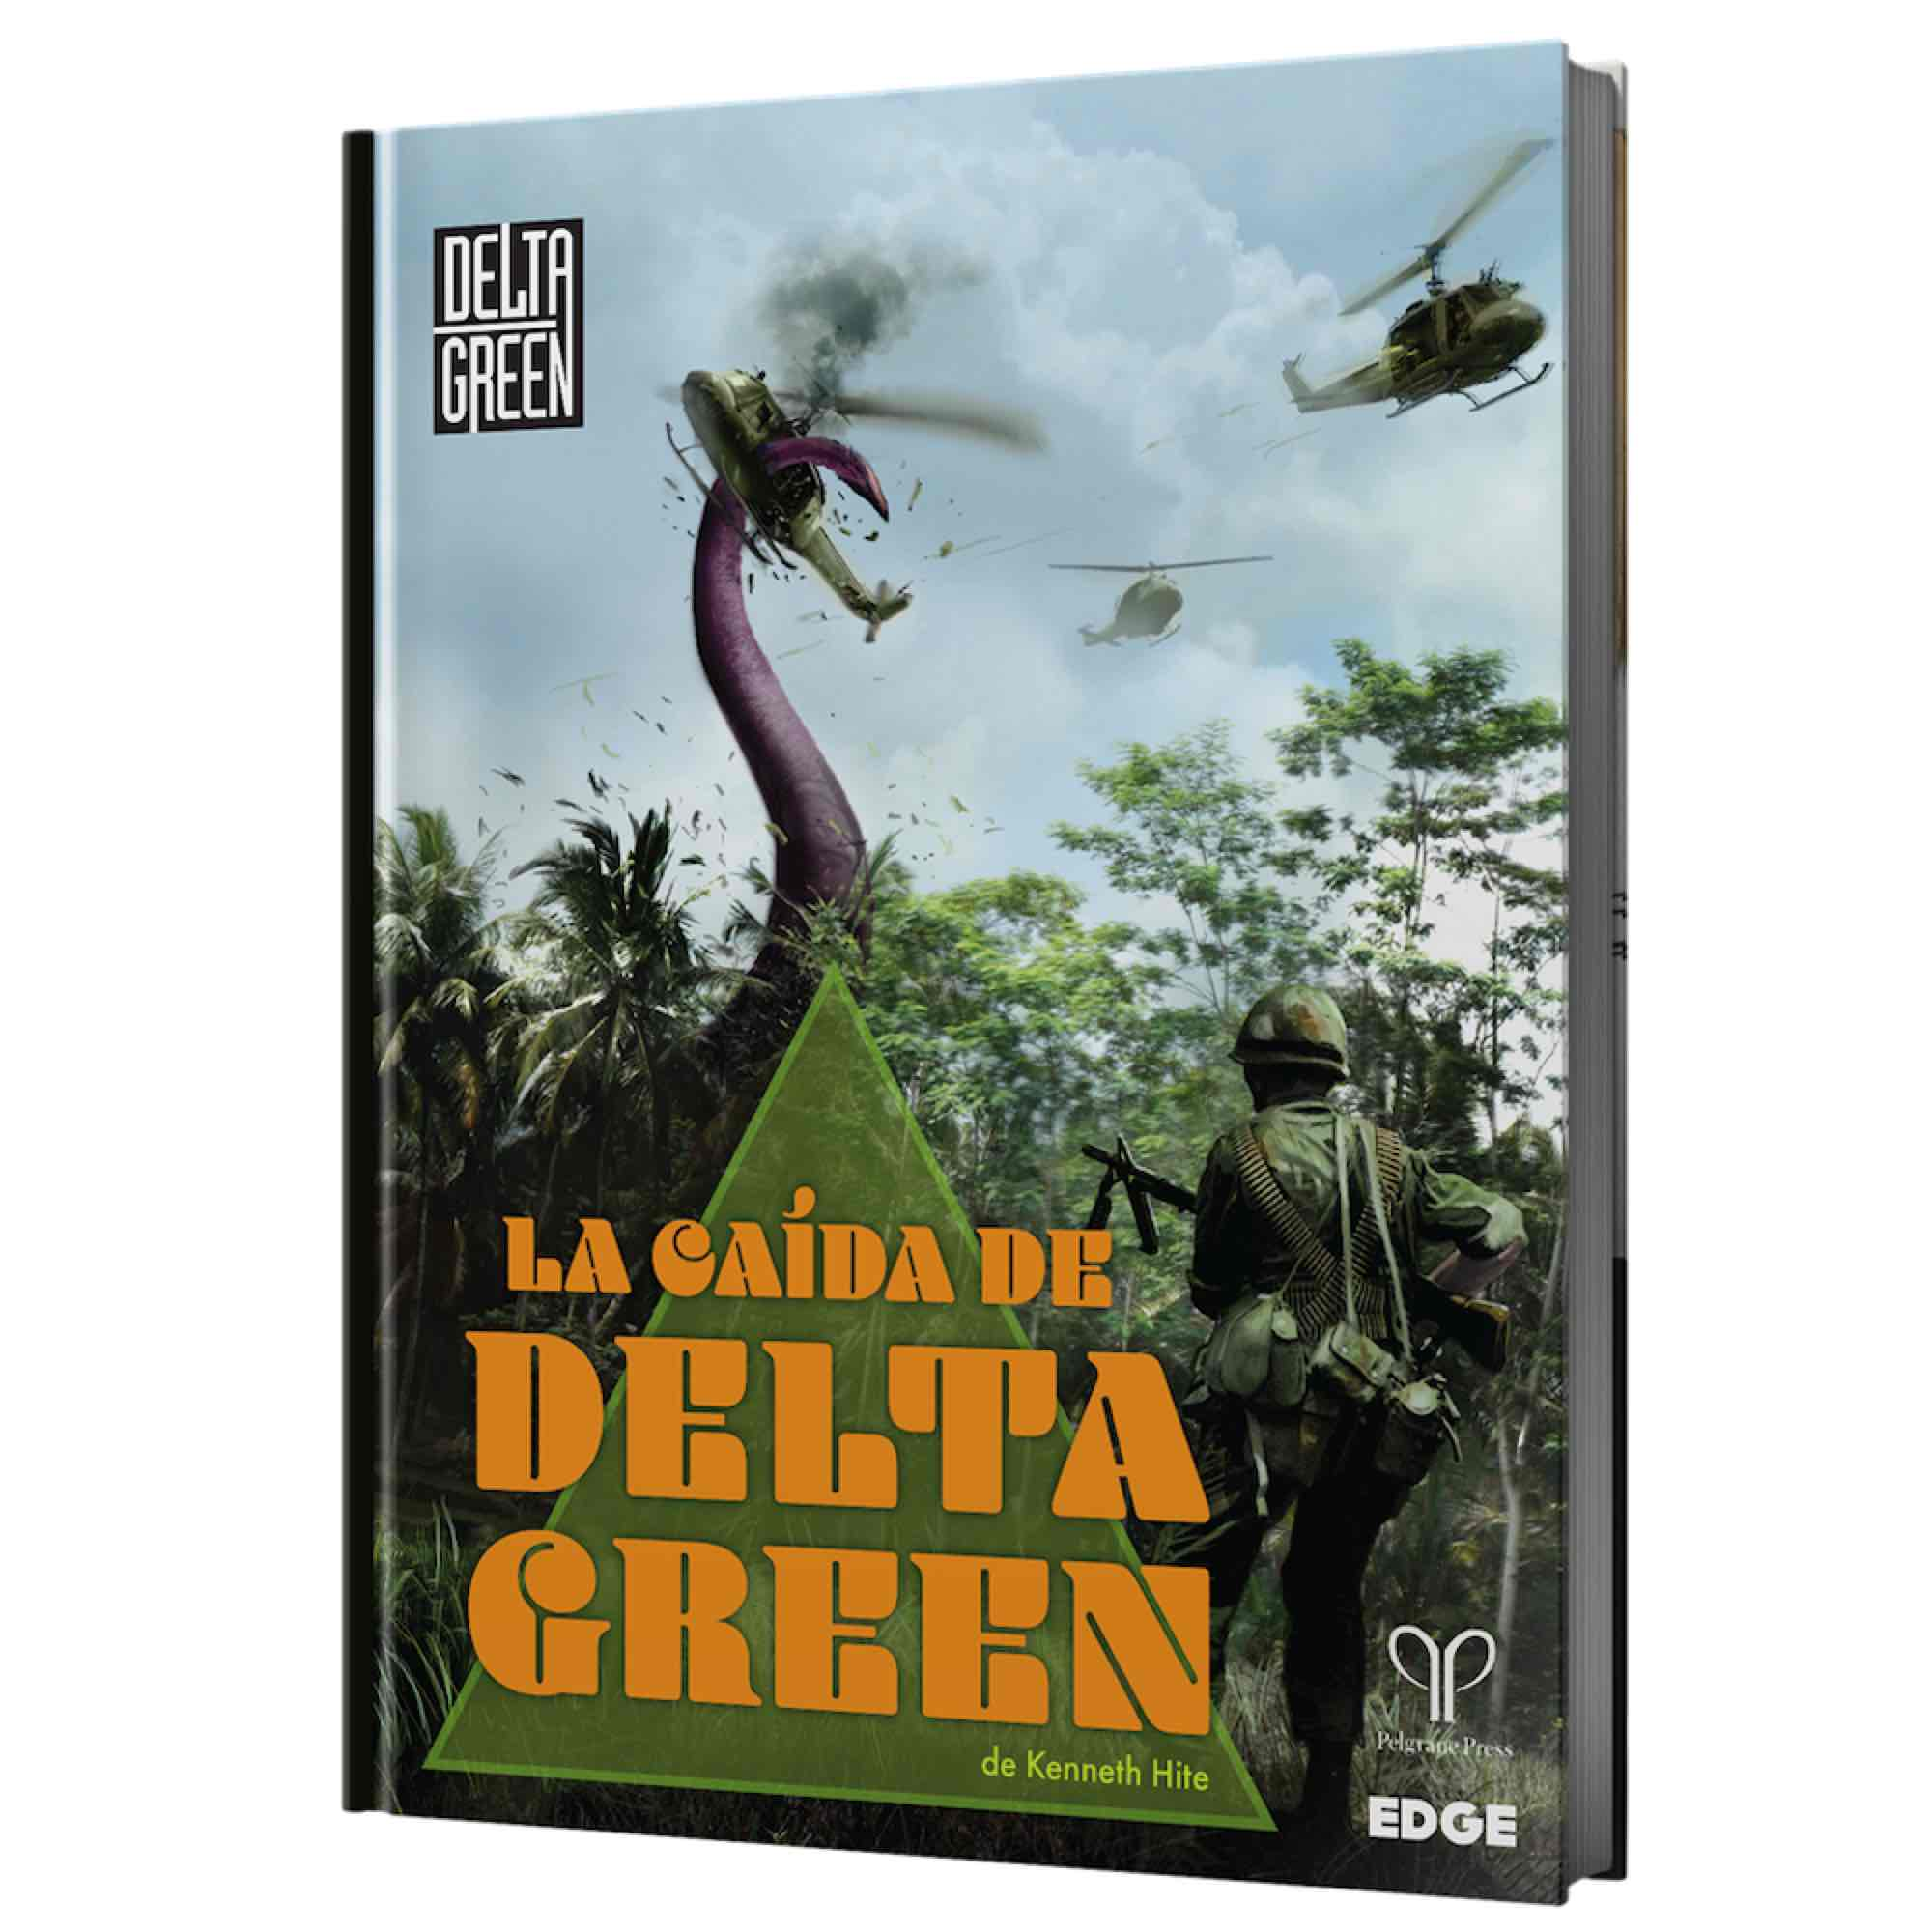 LACAIDA DE DELTA GREEN